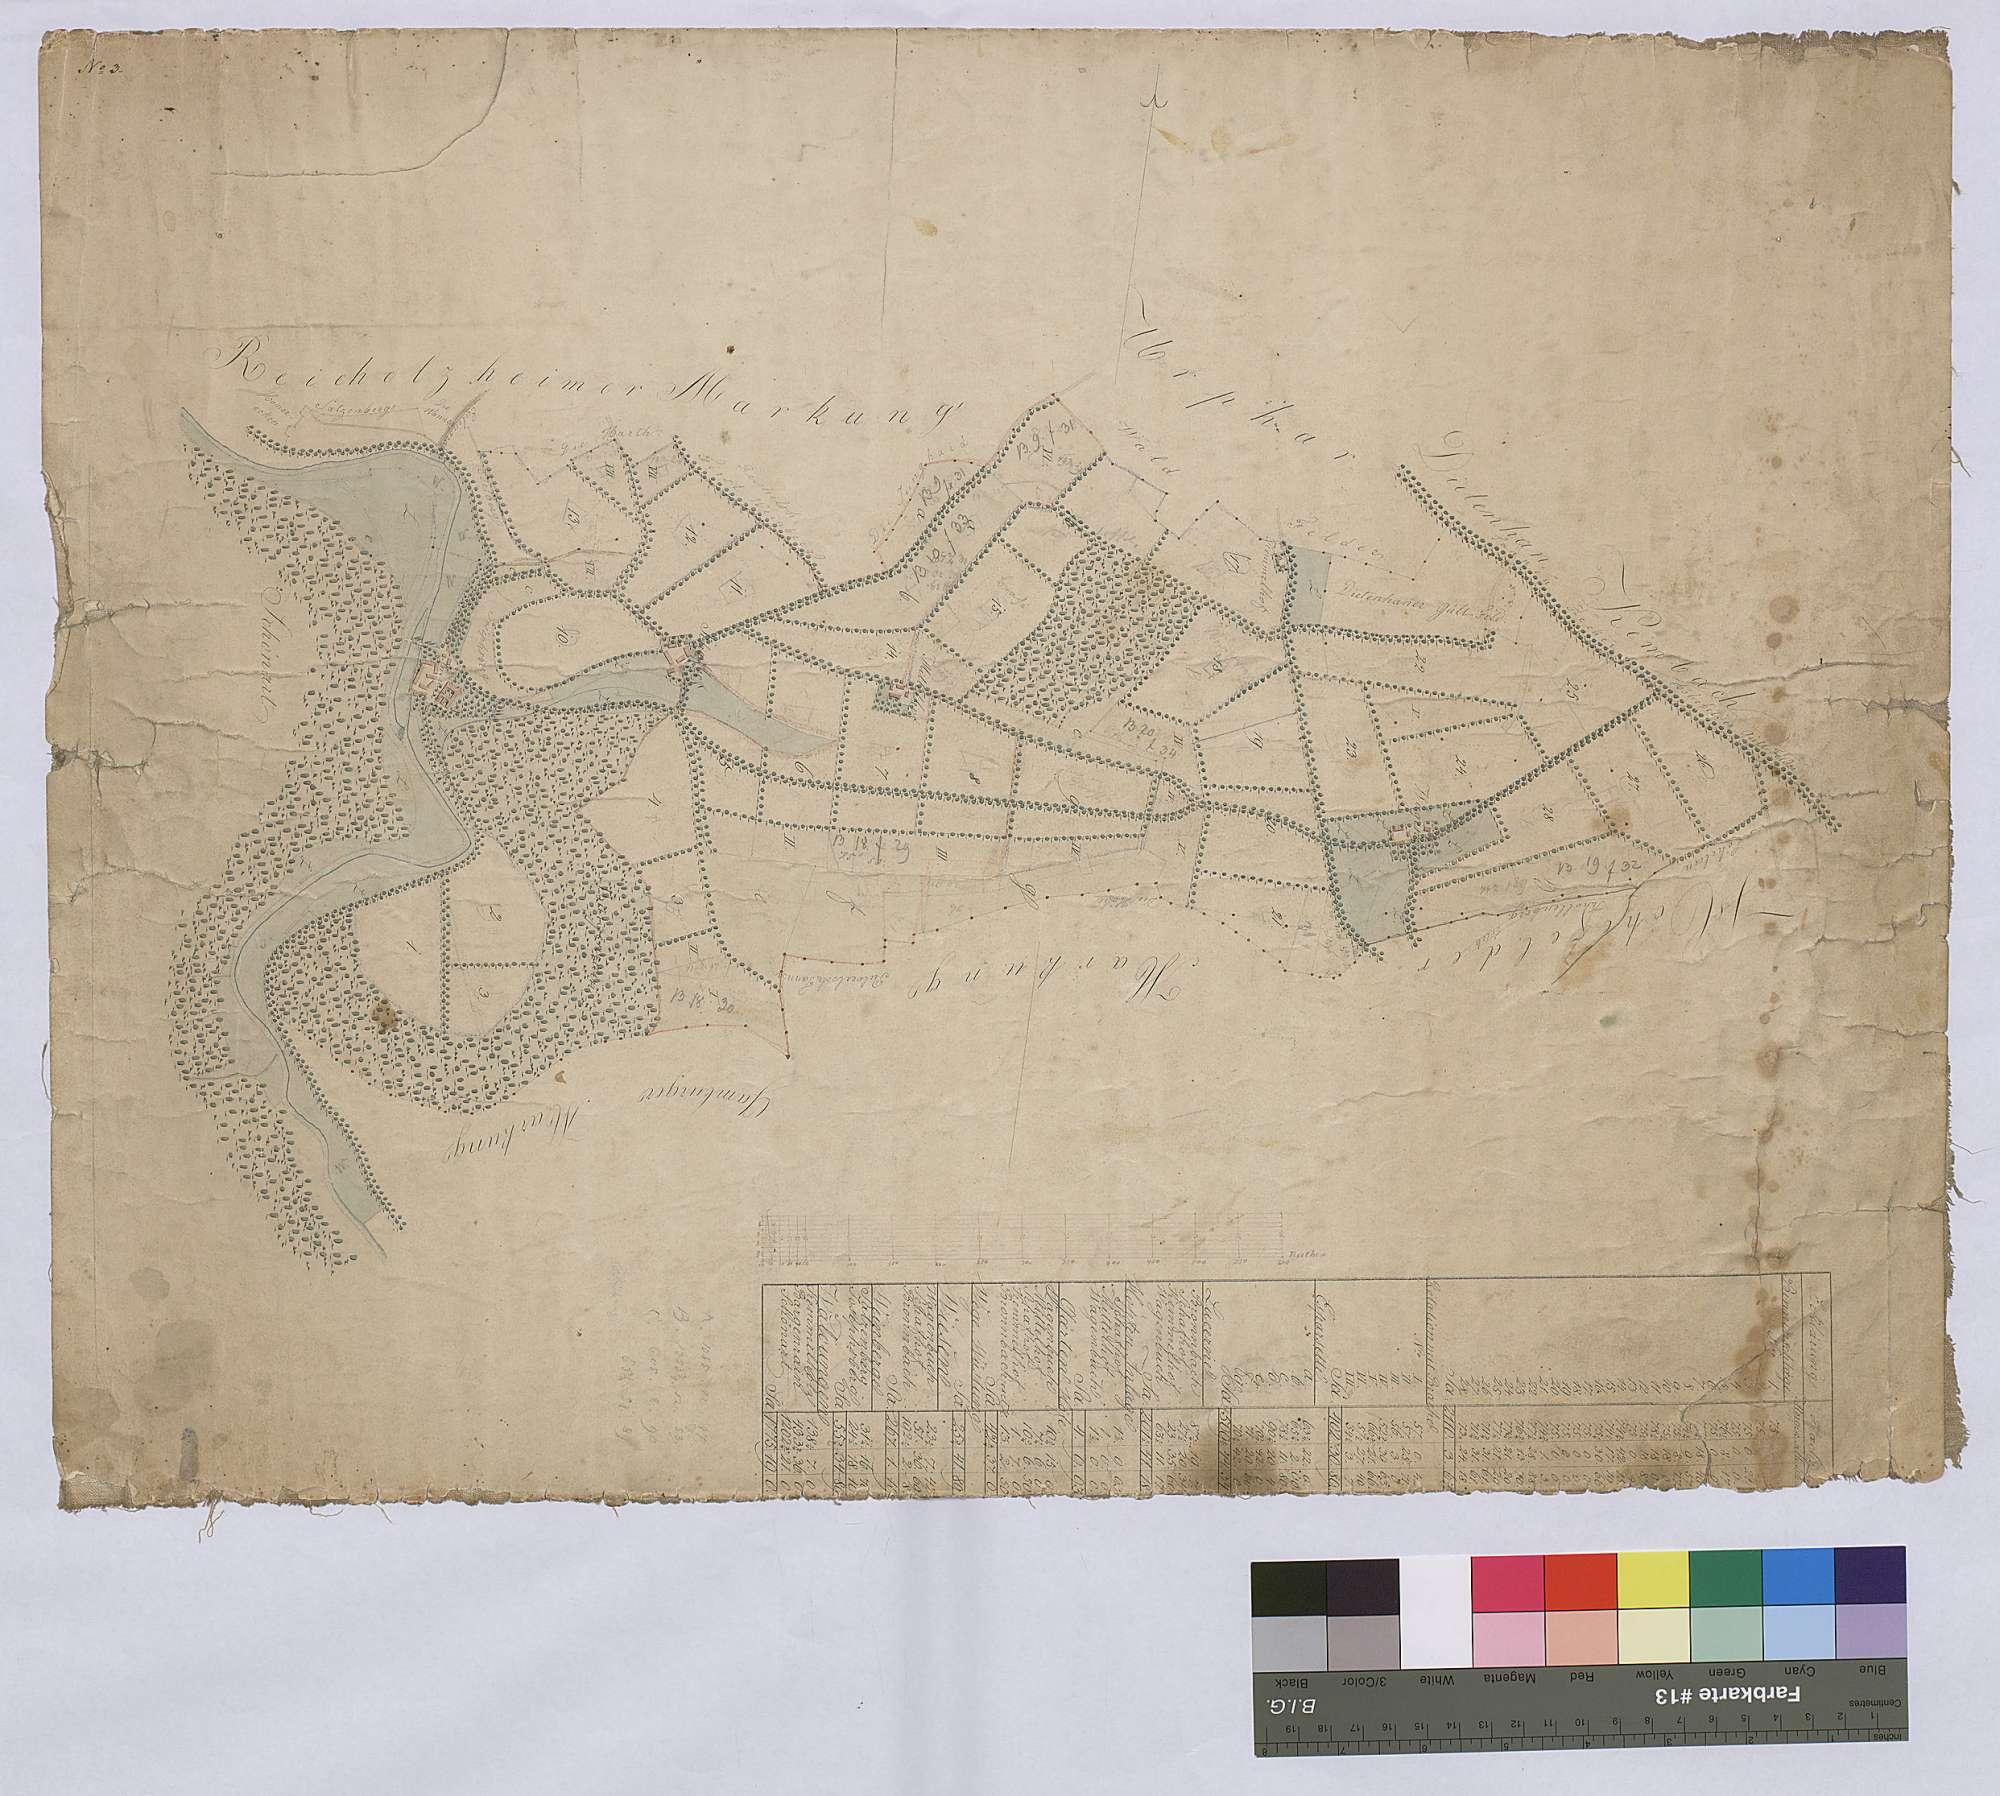 Felderanblümung der Höfe auf Bronnbacher Gemarkung (Inselkarte), Bild 1